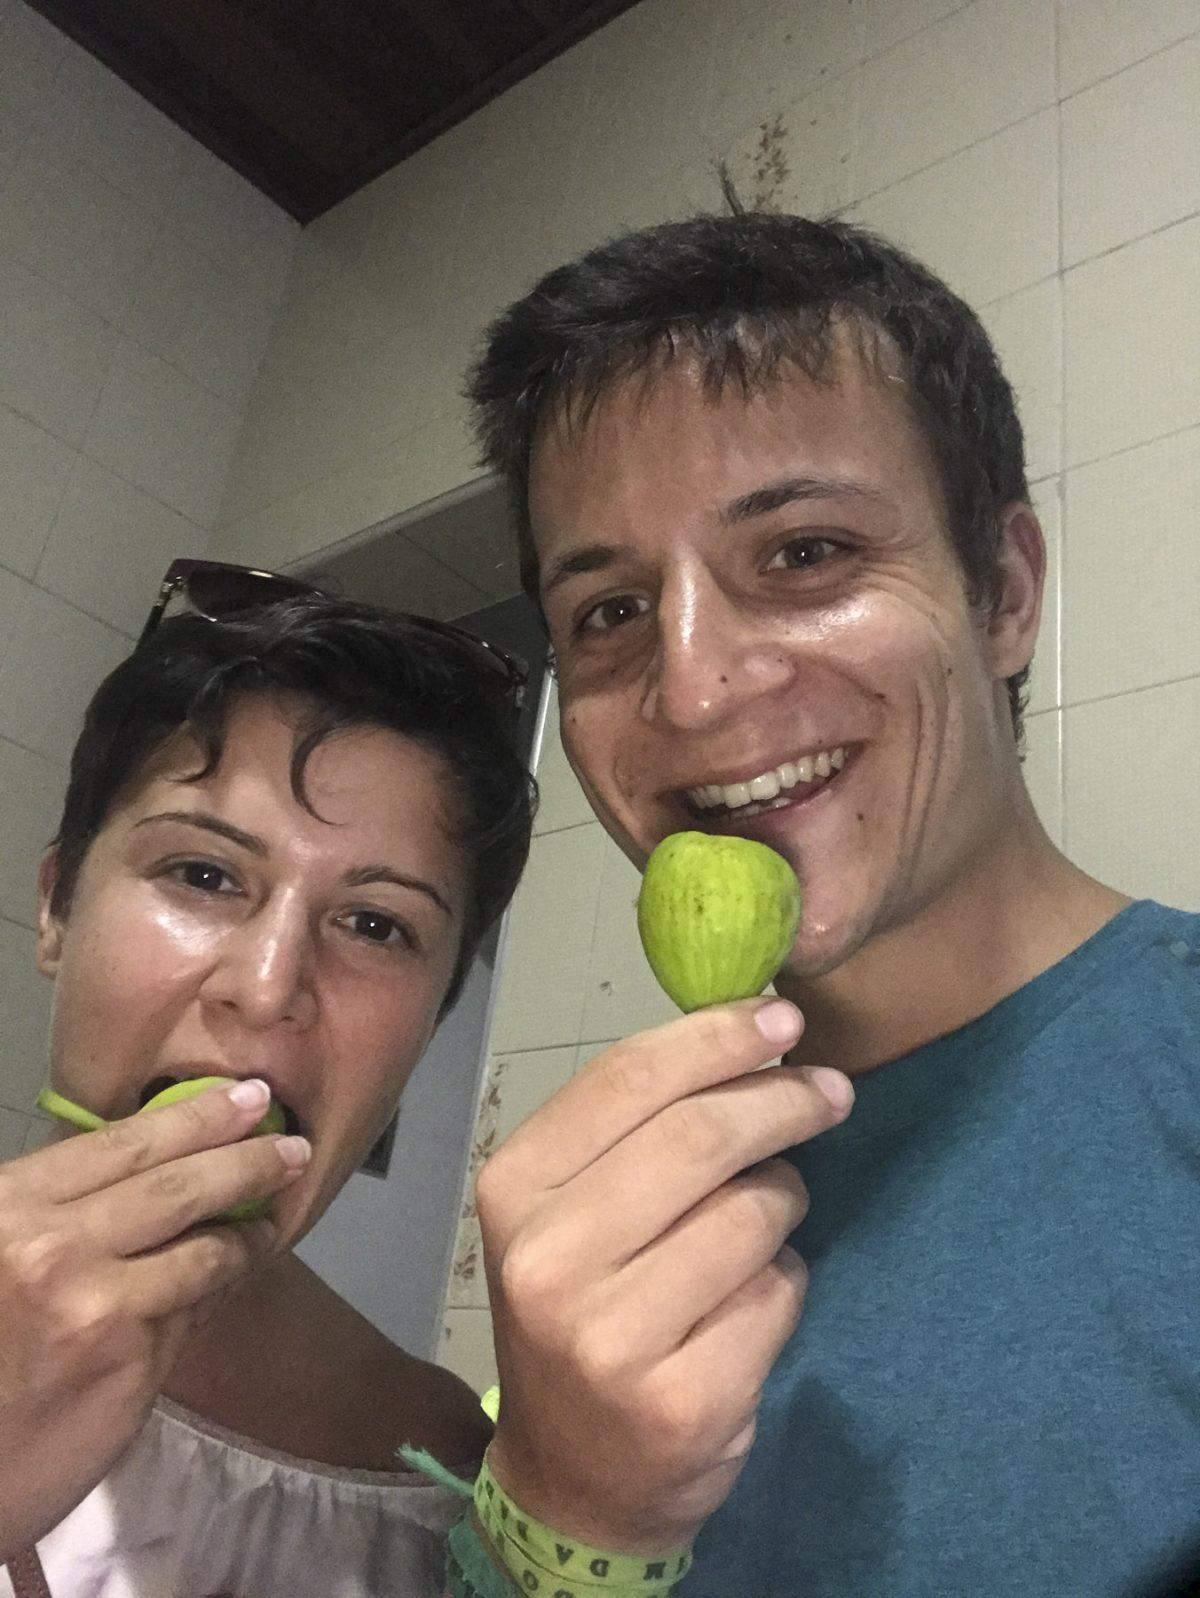 SP-Ibirapuera-IMG_3723-b-kl